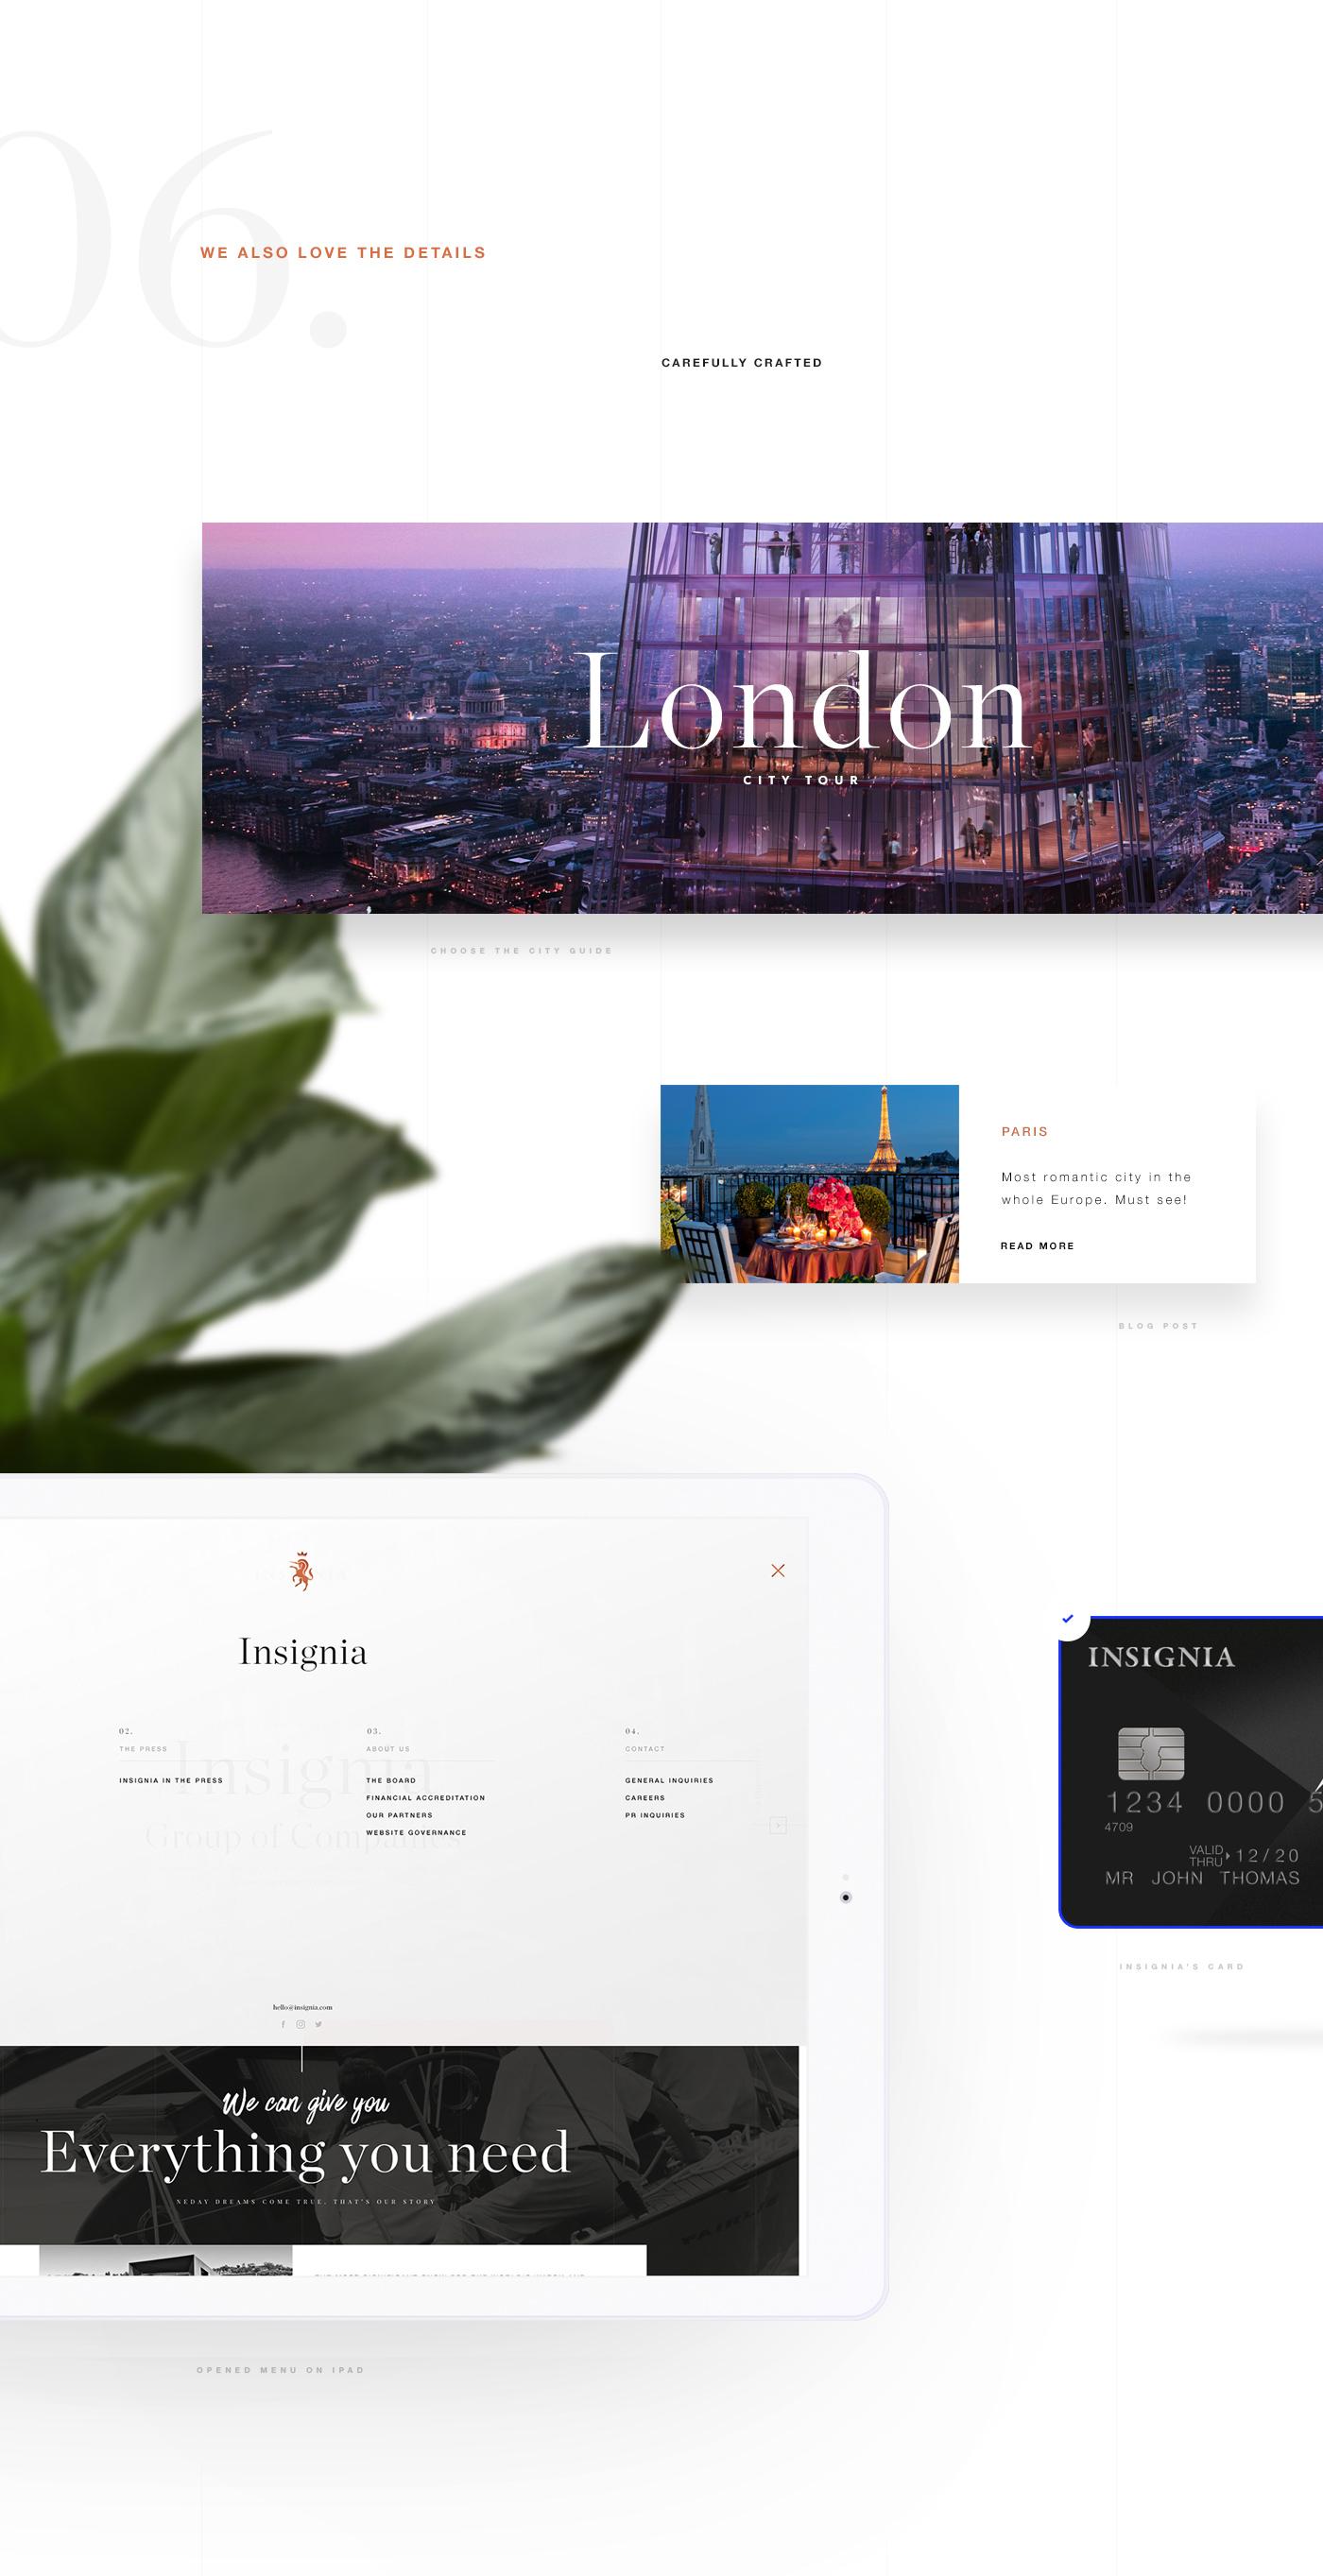 Webdesign userflow wittydigital app Bank finance creditcard concierge insignia London